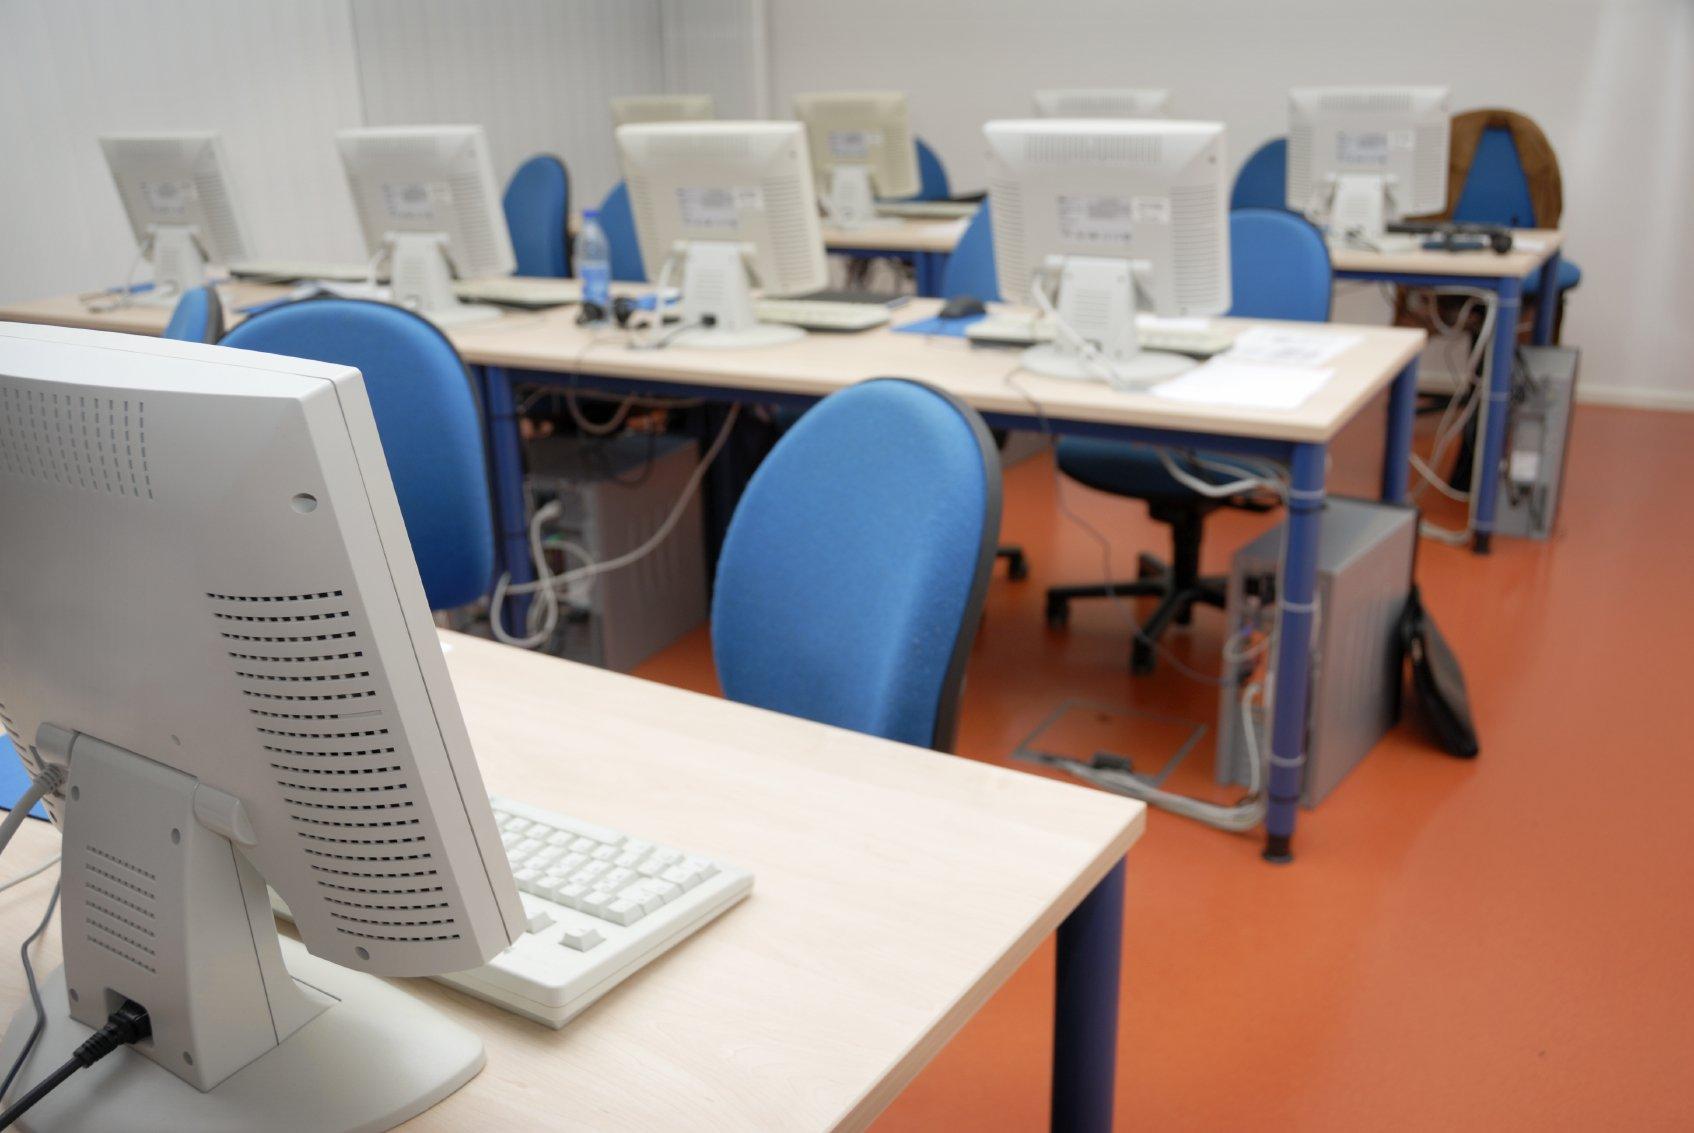 IT training centre